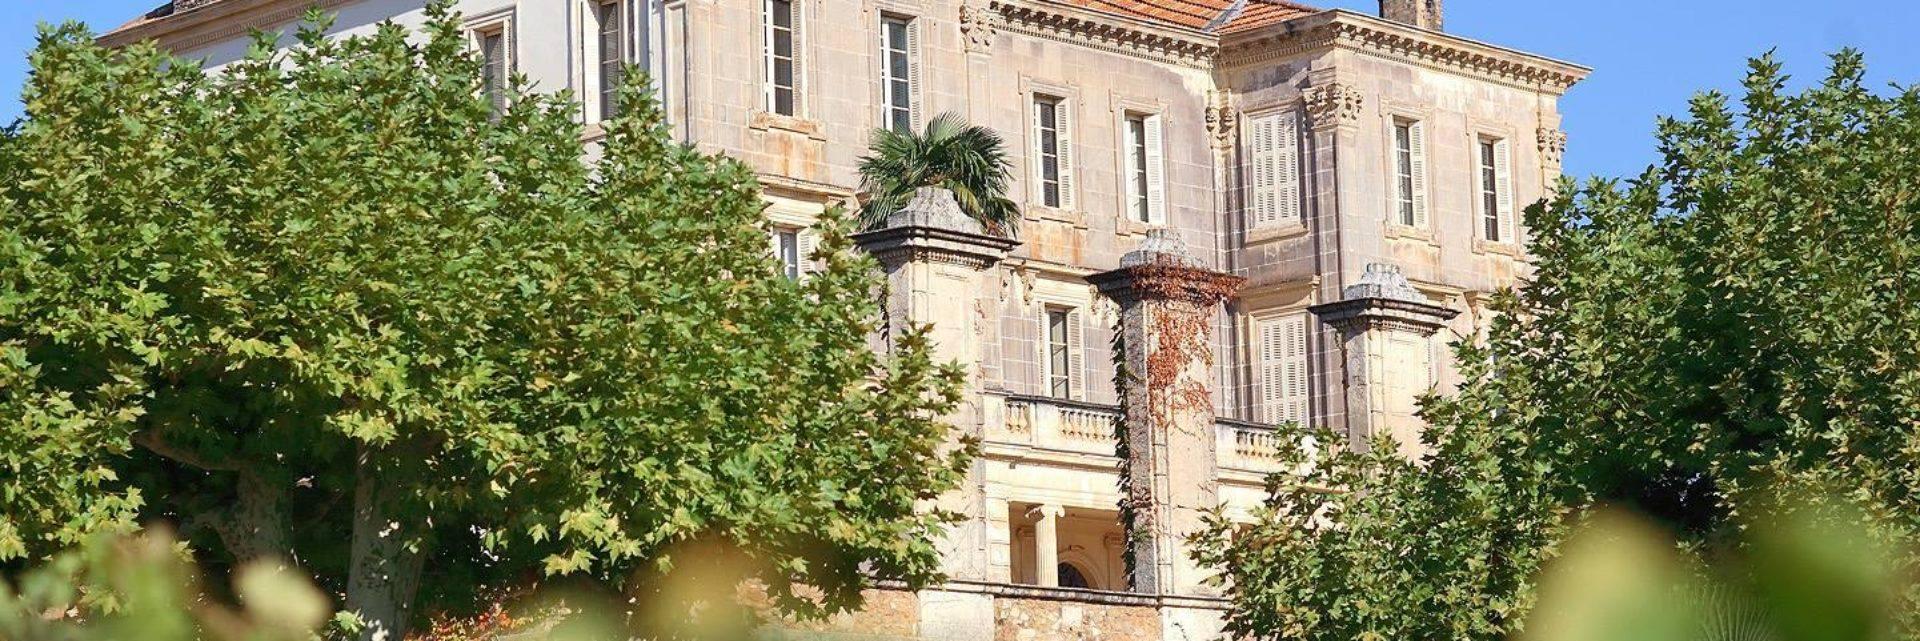 Château d'Astros à Vidauban